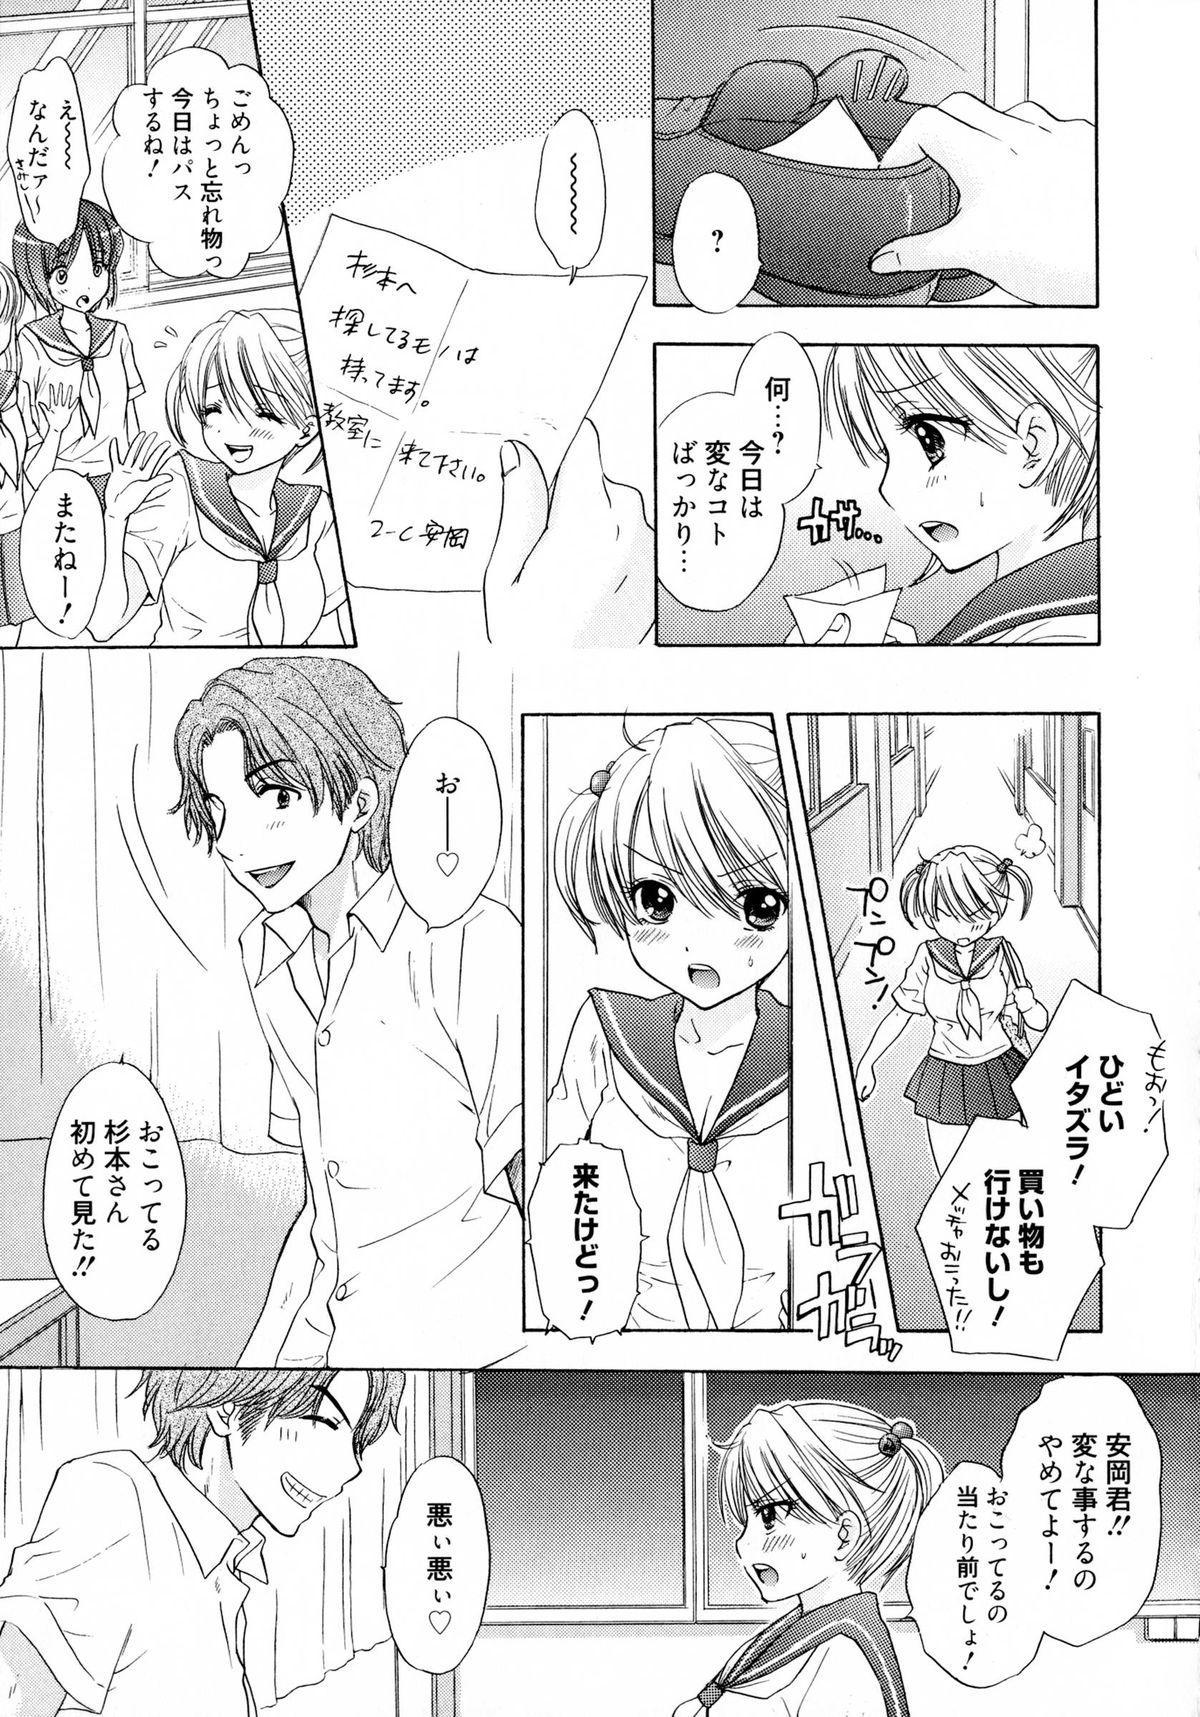 The Great Escape 4 Shokai Genteiban 74